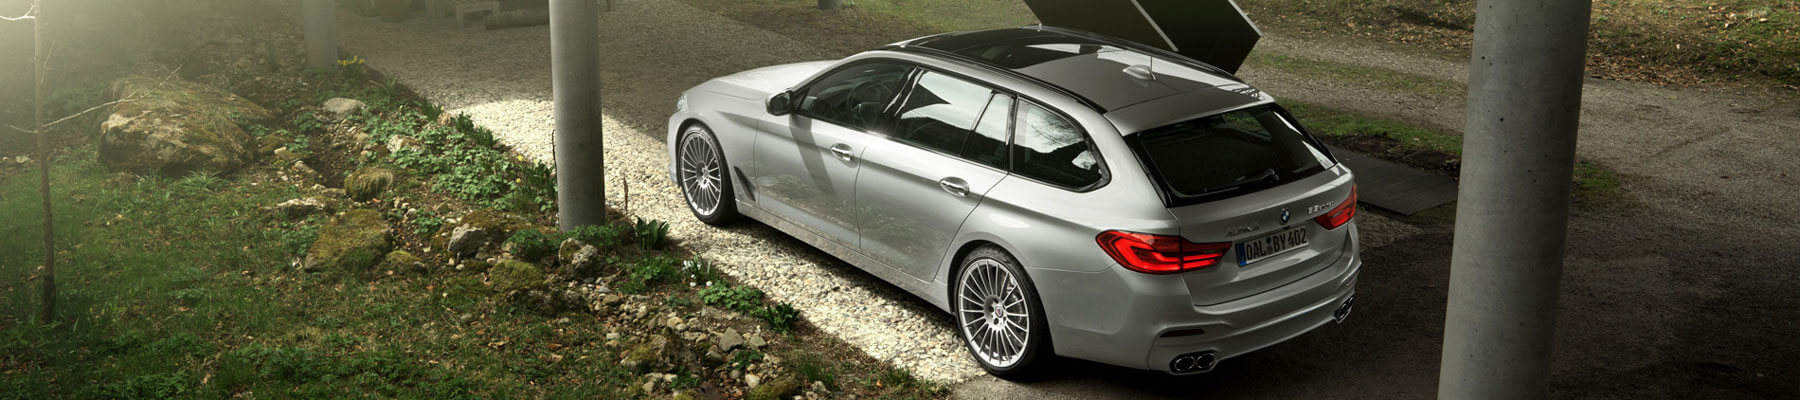 Alpina Modelle